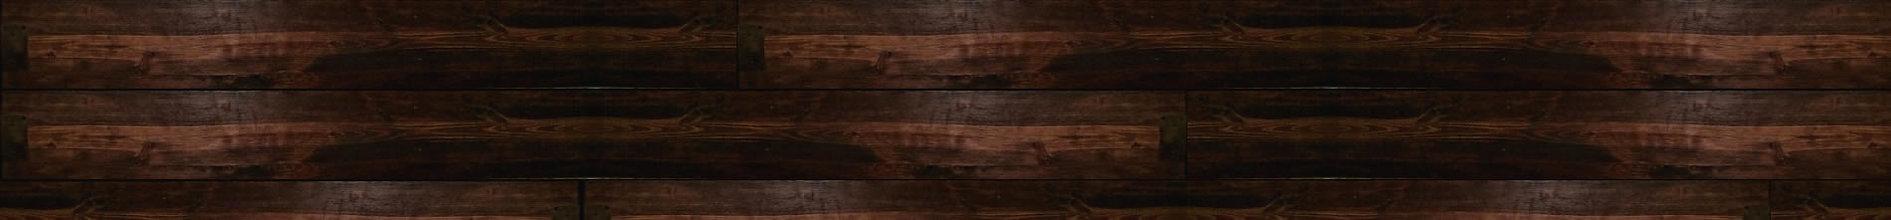 Wood-Header-1.jpg